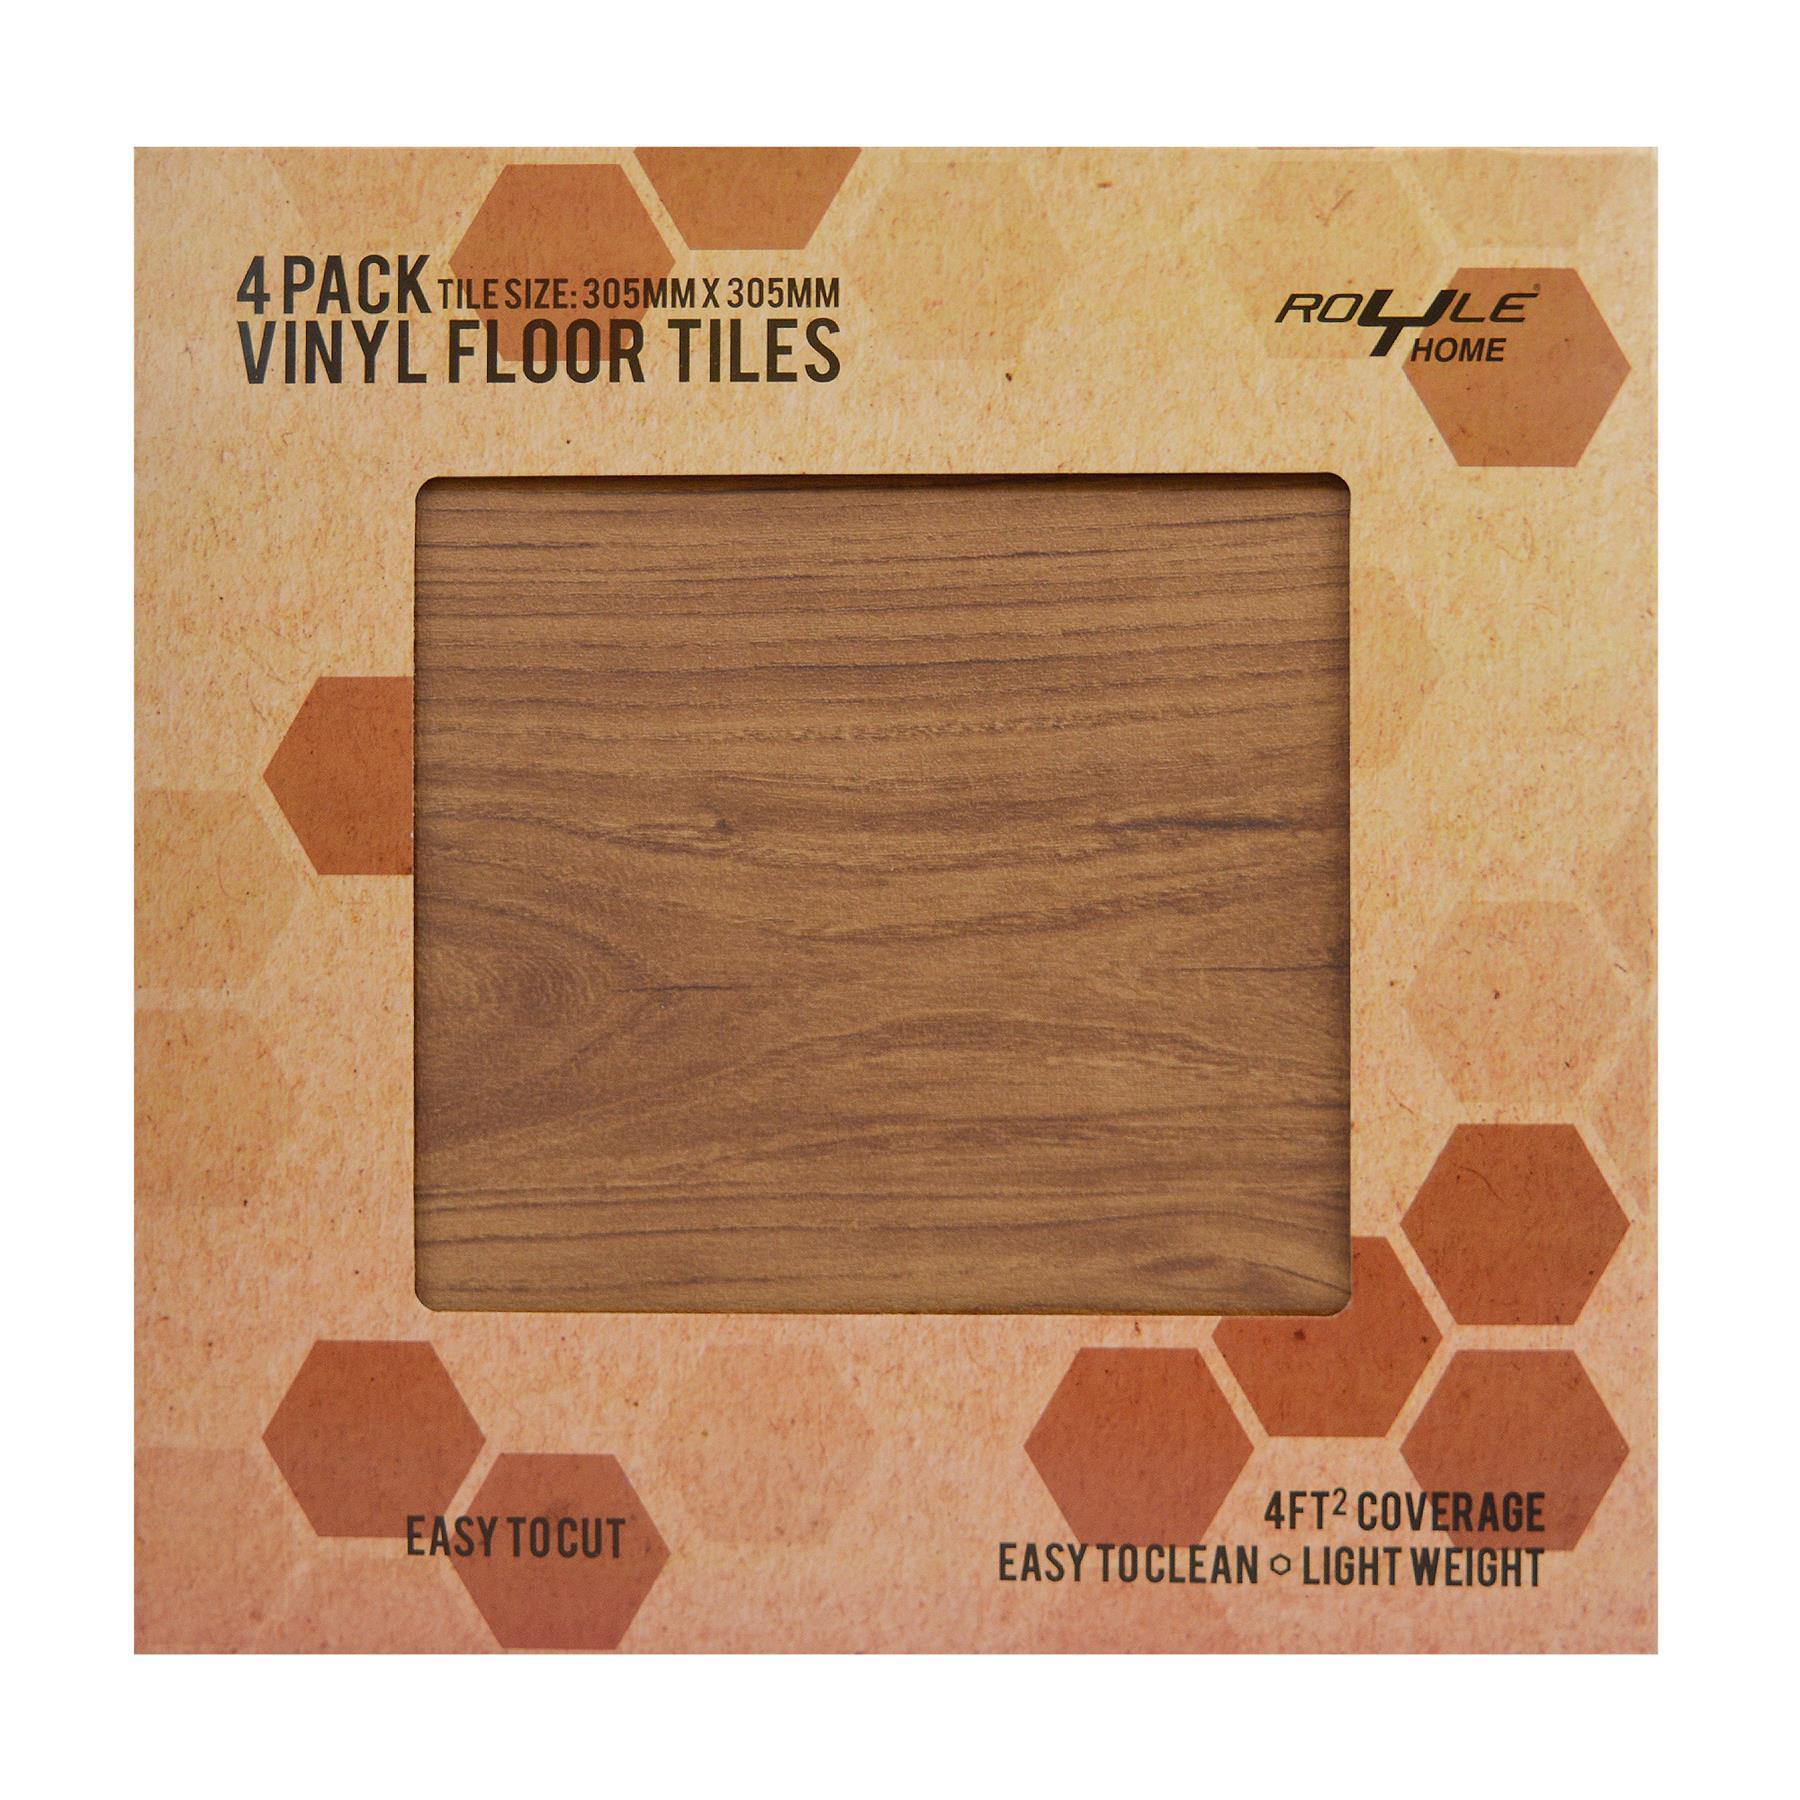 Floor-Tiles-Self-Adhesive-Vinyl-Flooring-Kitchen-Bathroom-Brown-Wood-Grain thumbnail 7